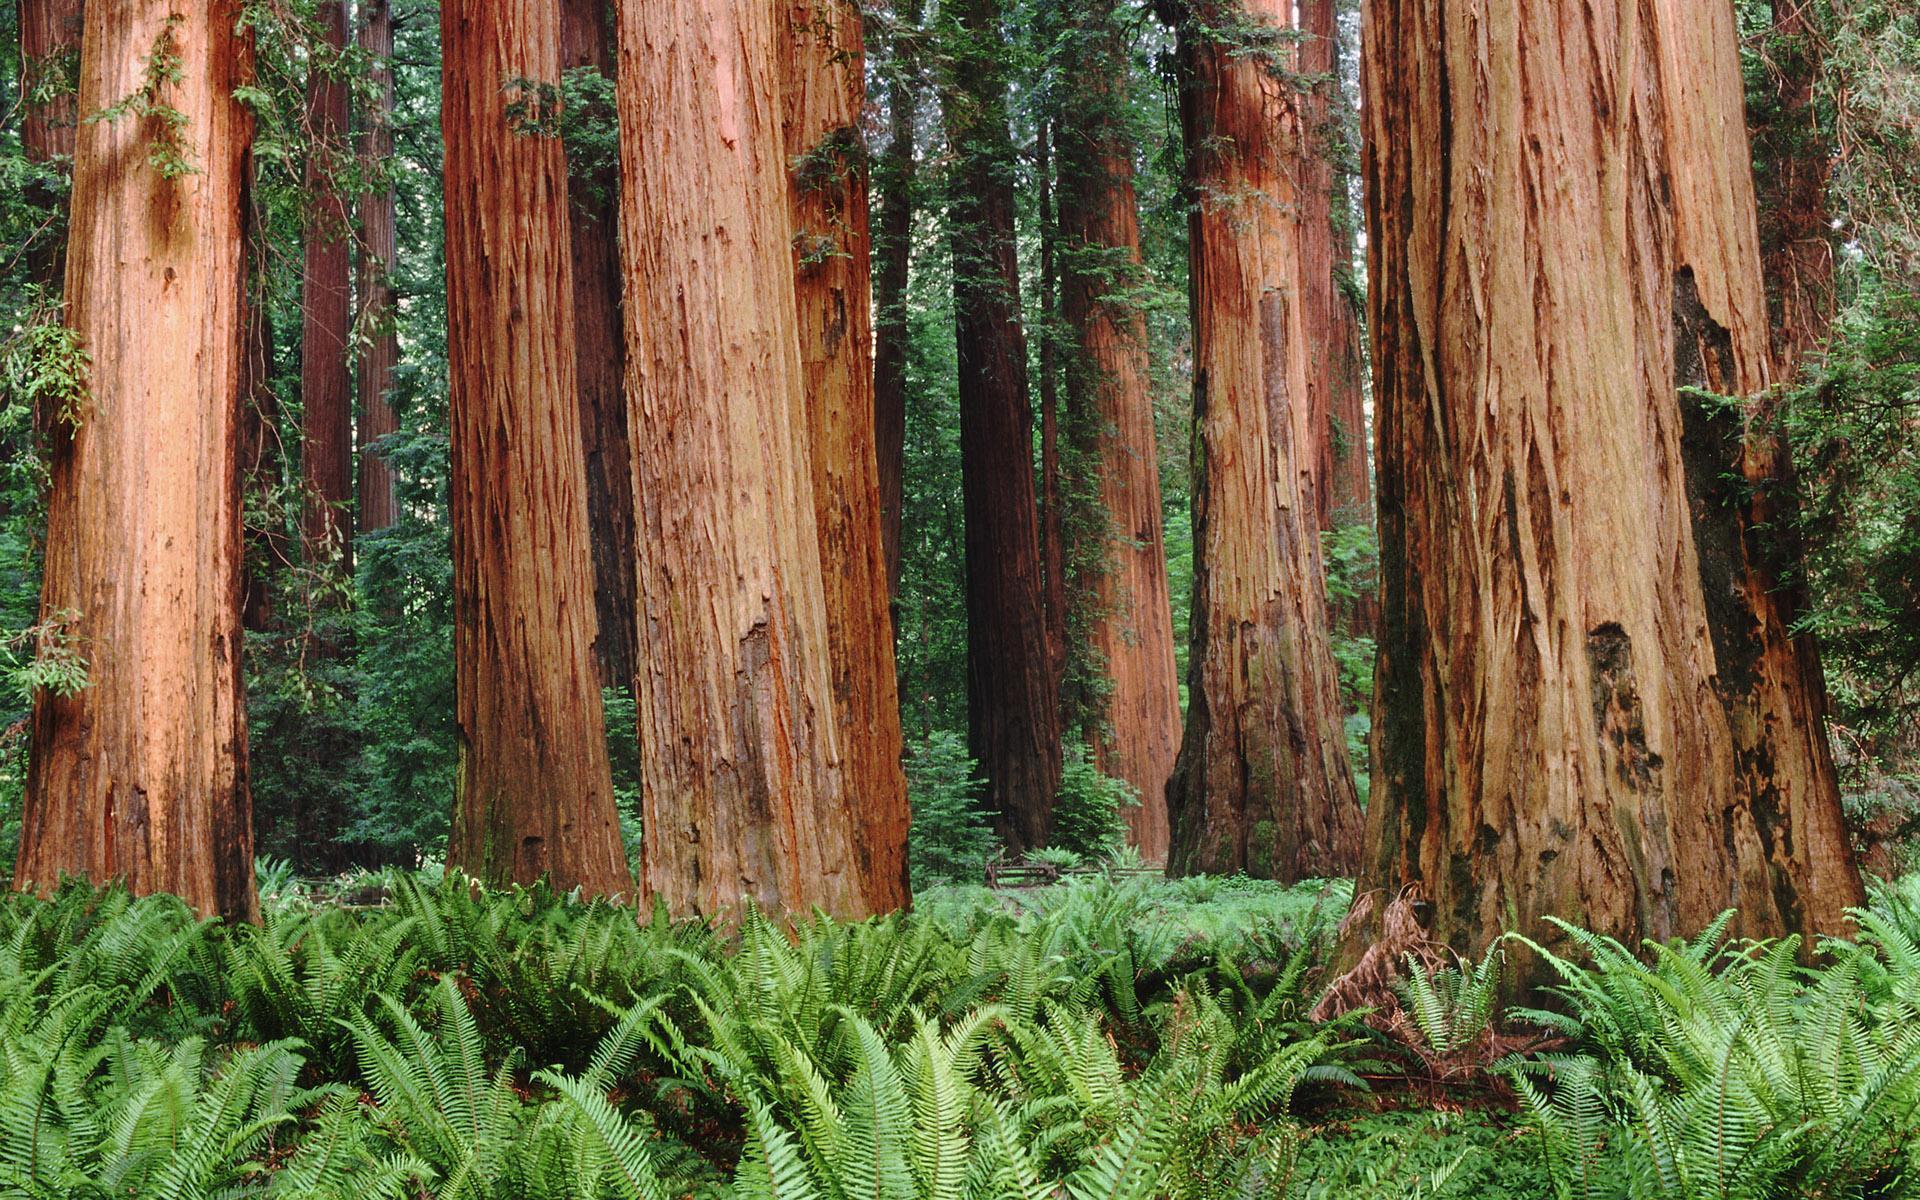 4k wallpaper nature redwoods - photo #11